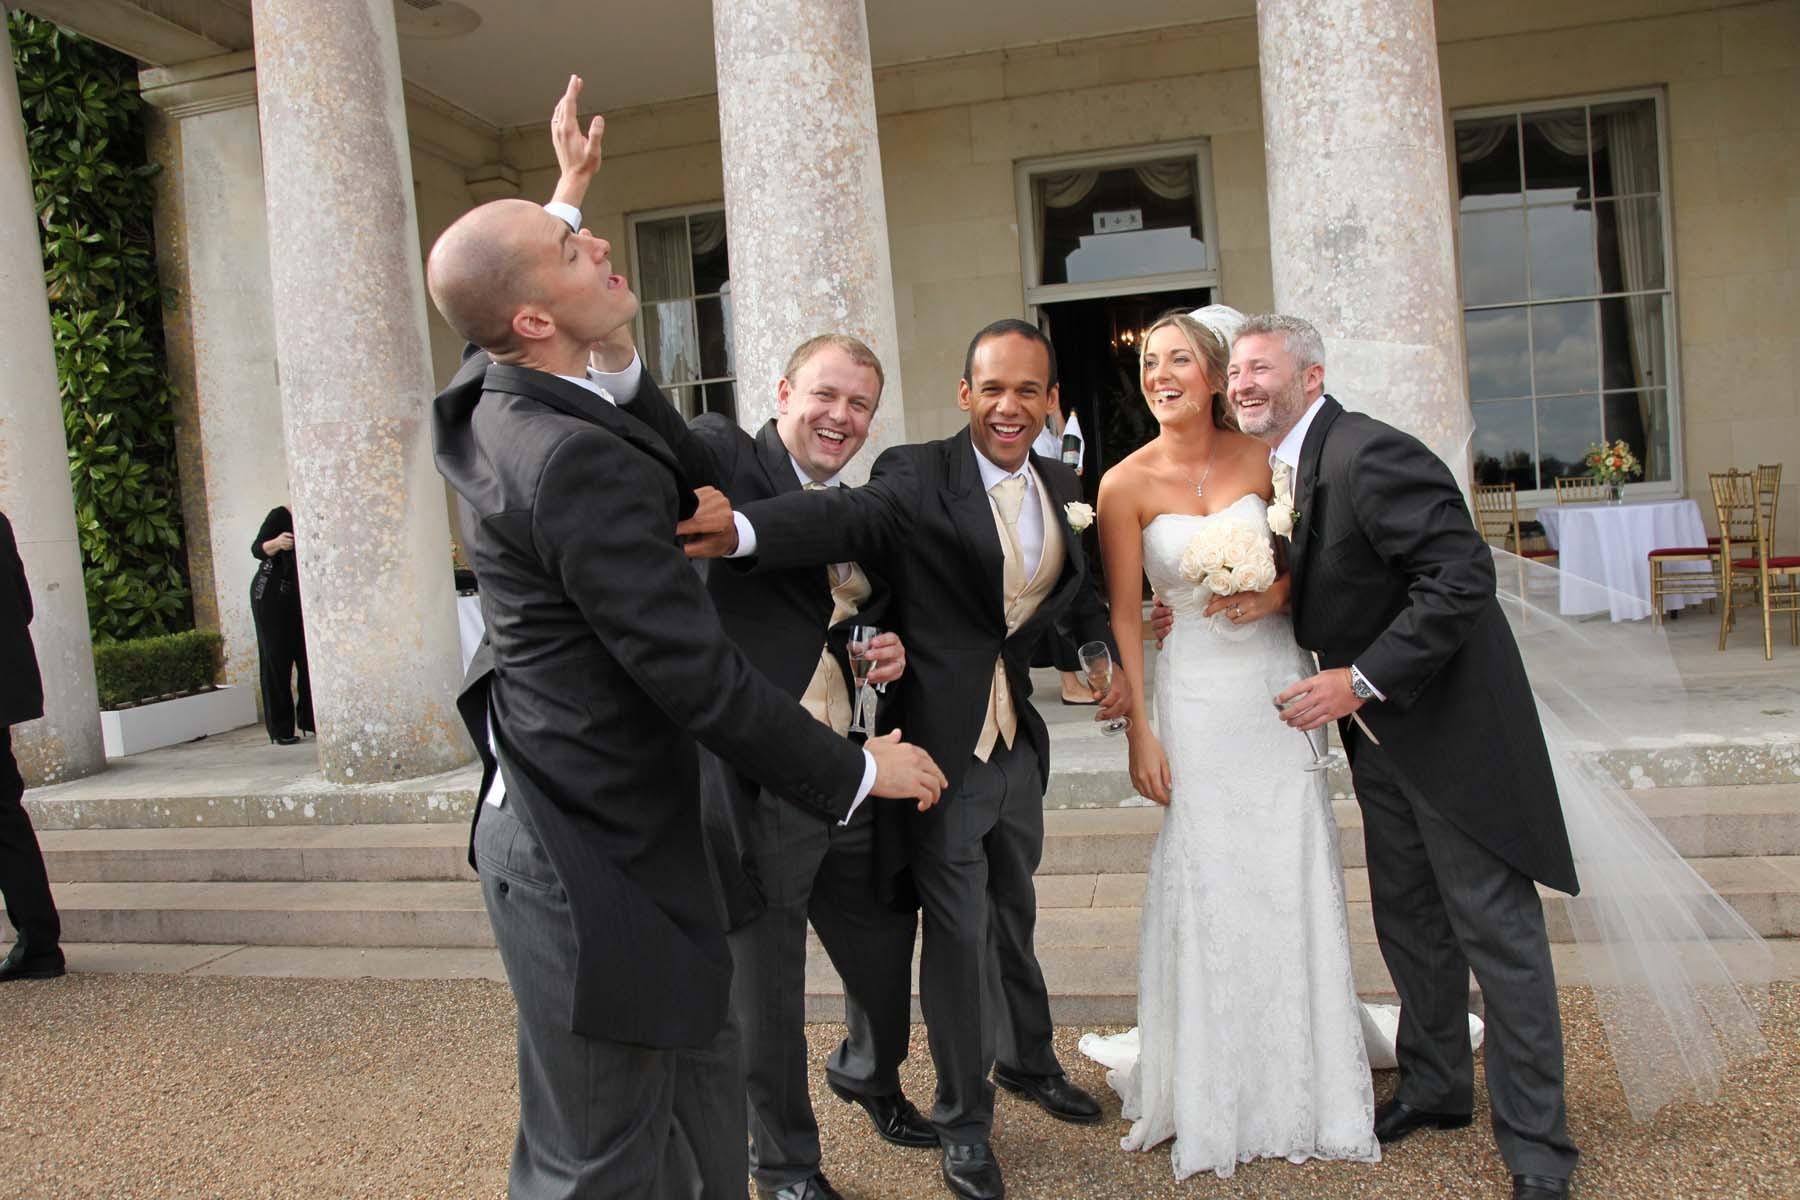 Sussex & Surrey Wedding Photographer - Guests & Groups (35)